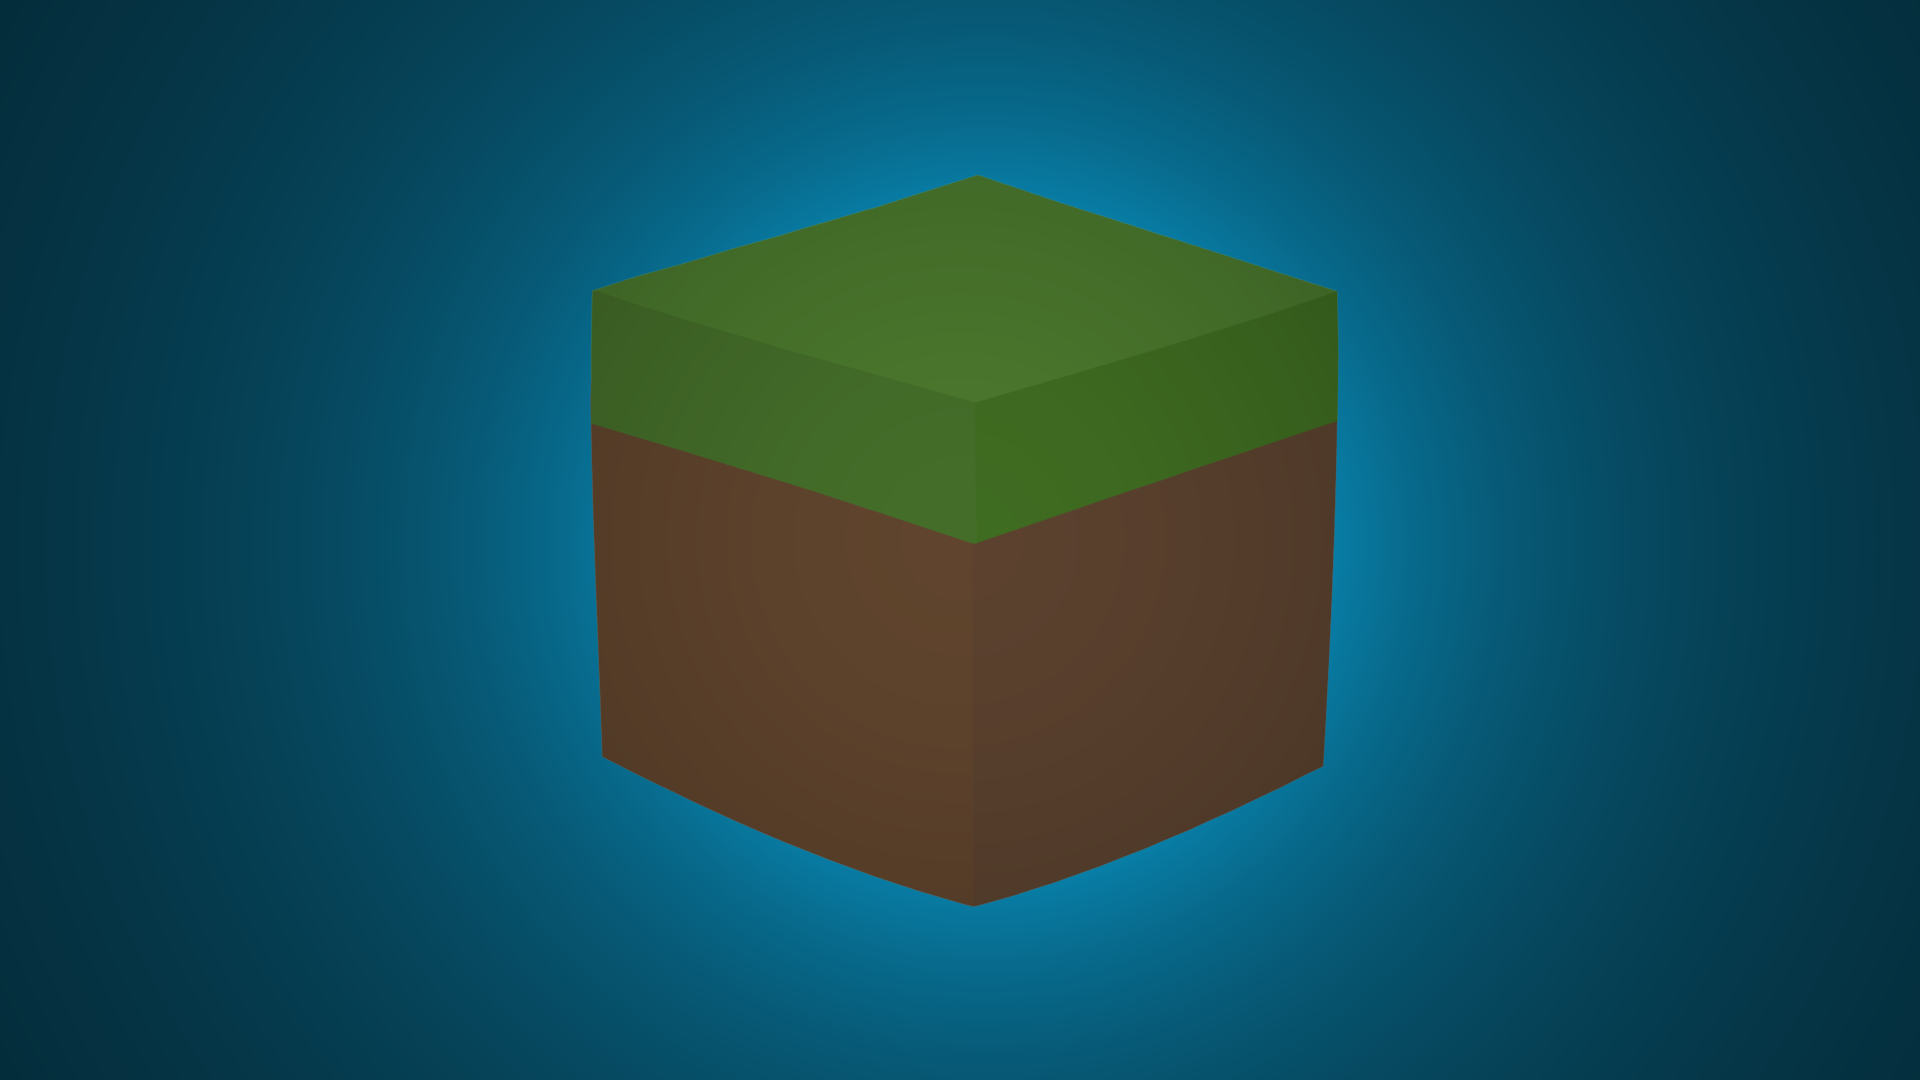 Minecraft minimalist grass block wallpaper by darkgs on Block wallpaper